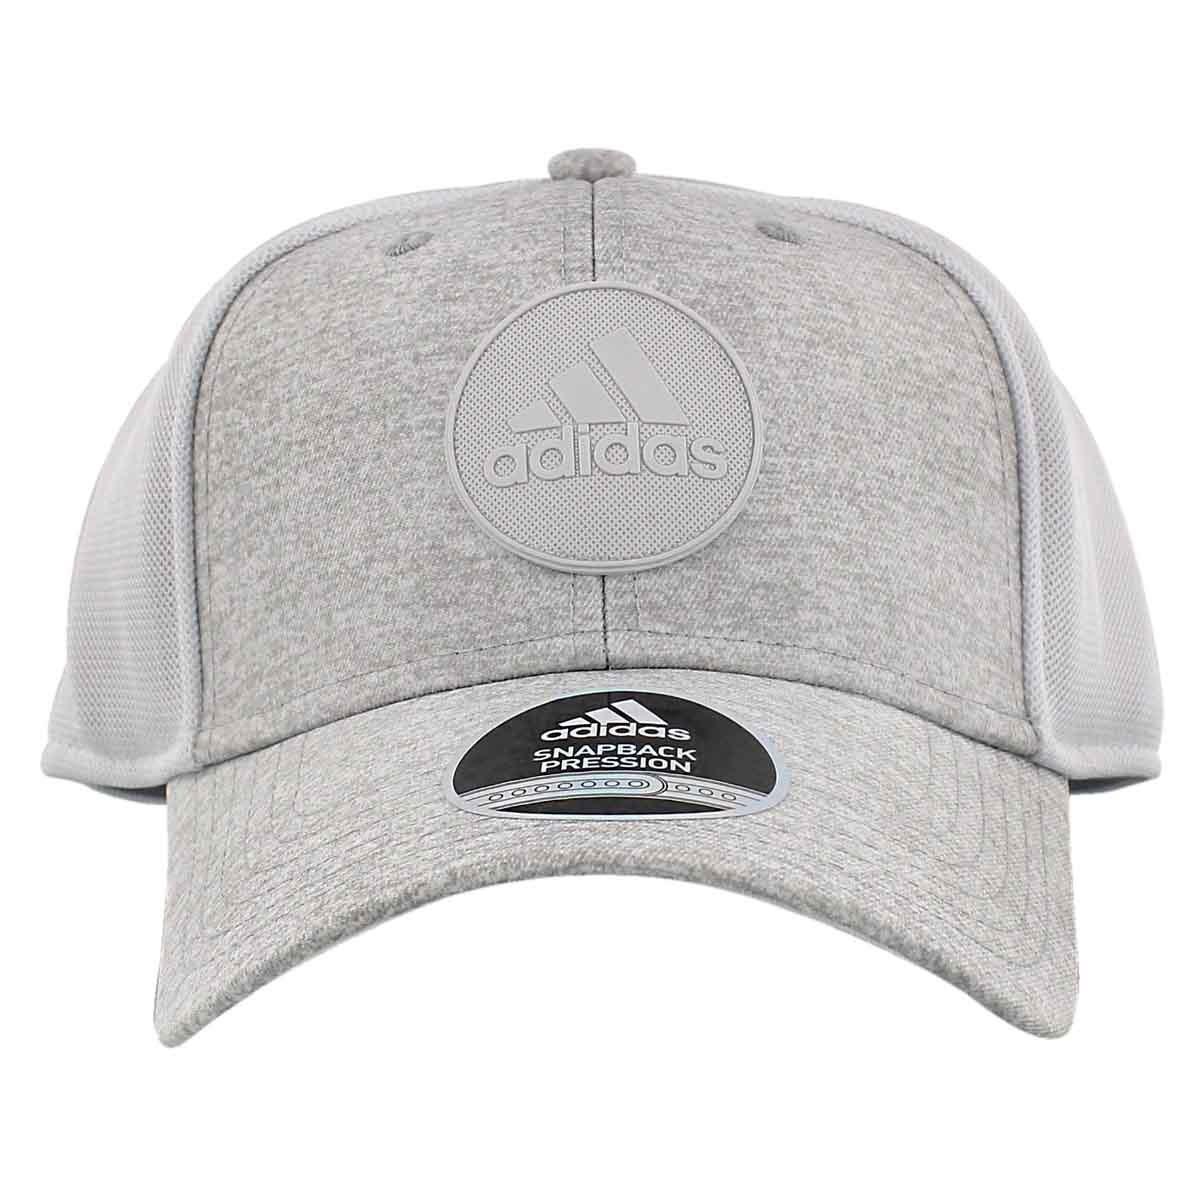 Men's THRILL white/grey snapback caps